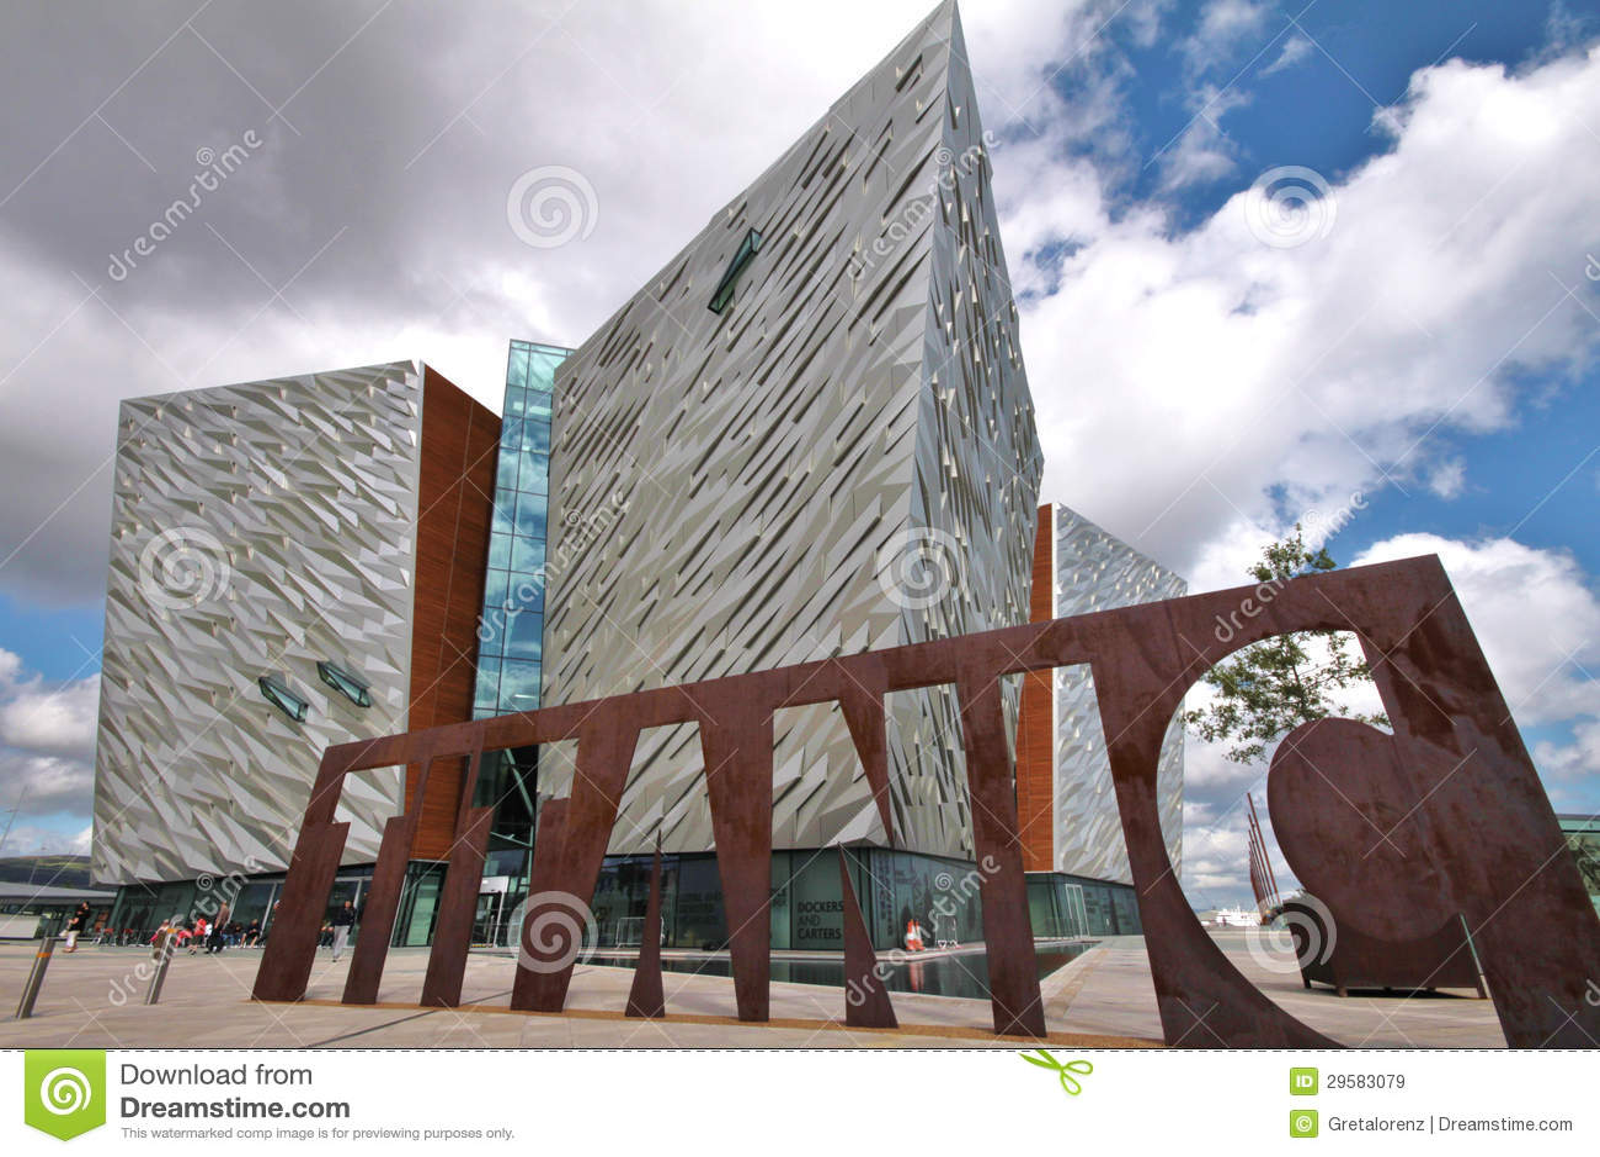 Titanic Museum and cloudy sky, Belfast